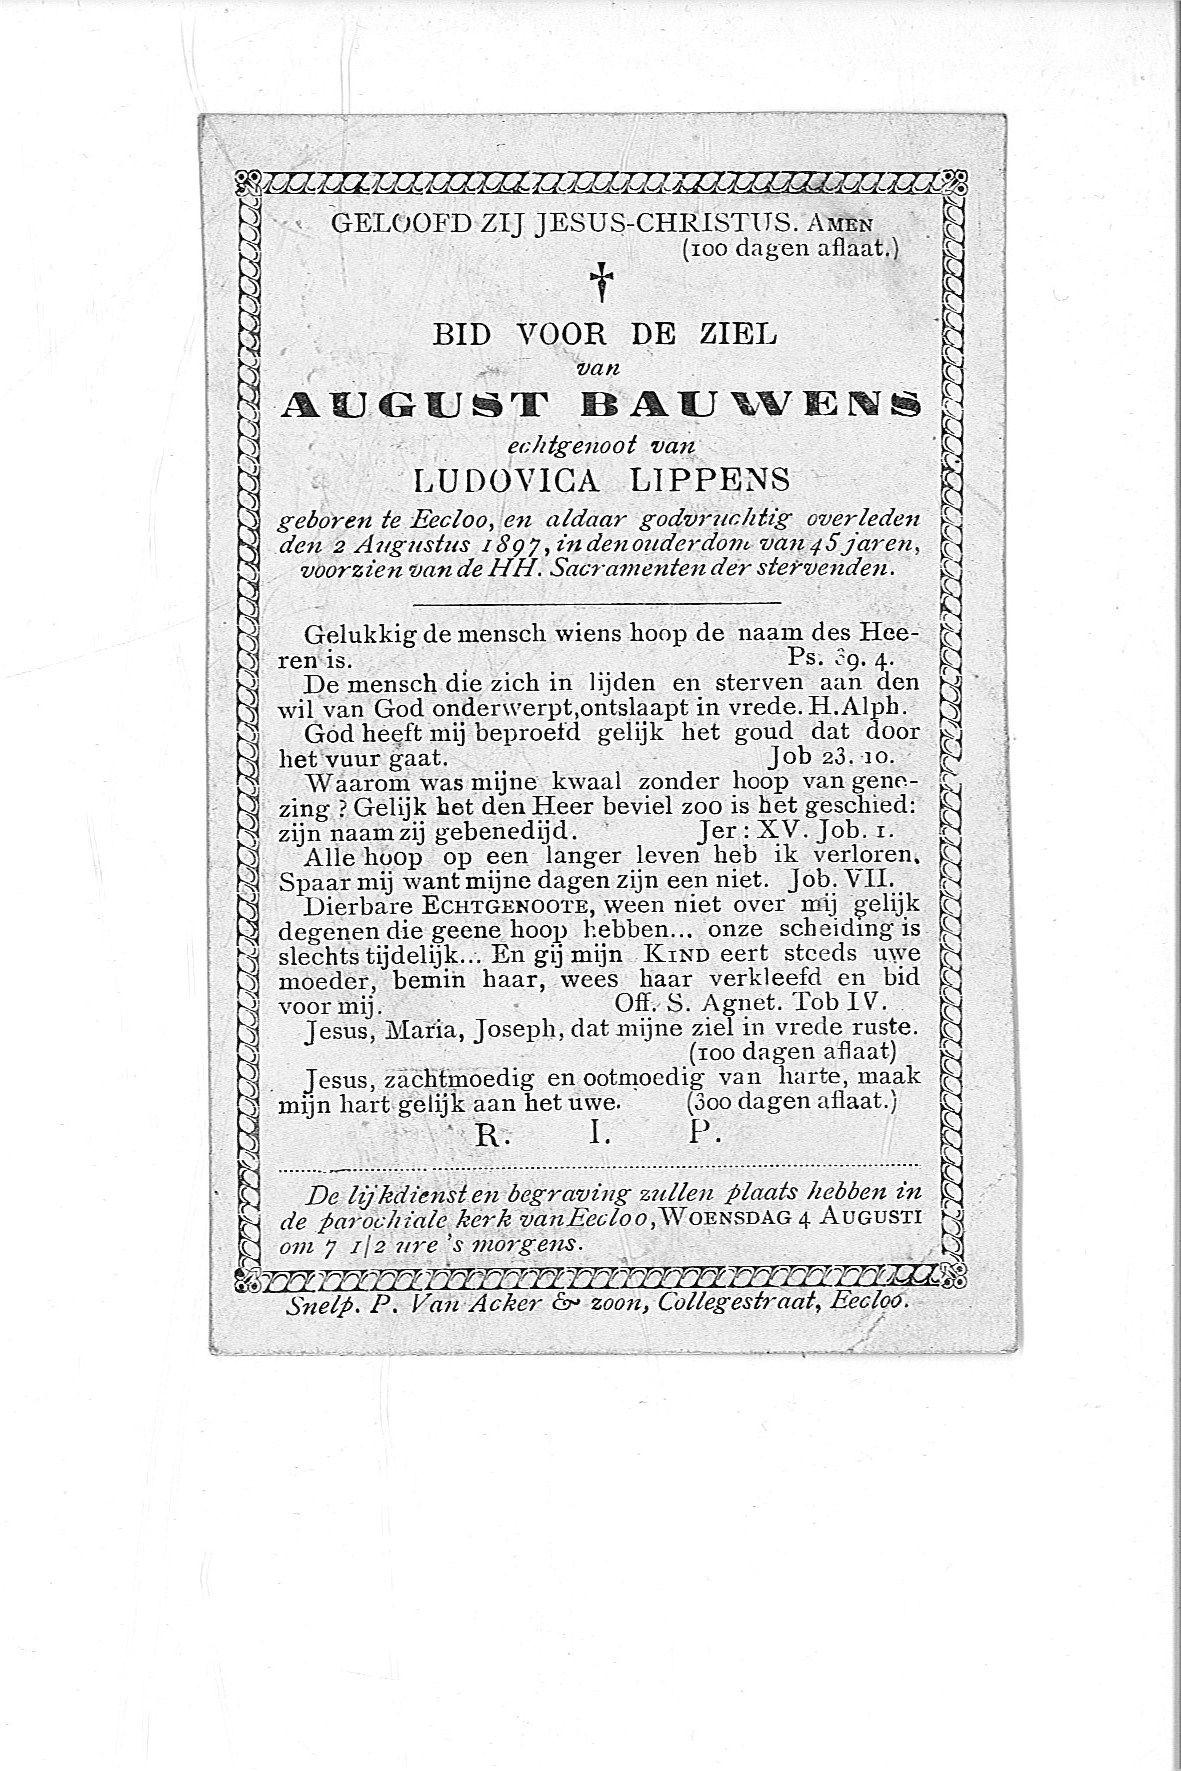 August(1898)20090806114958_00001.jpg